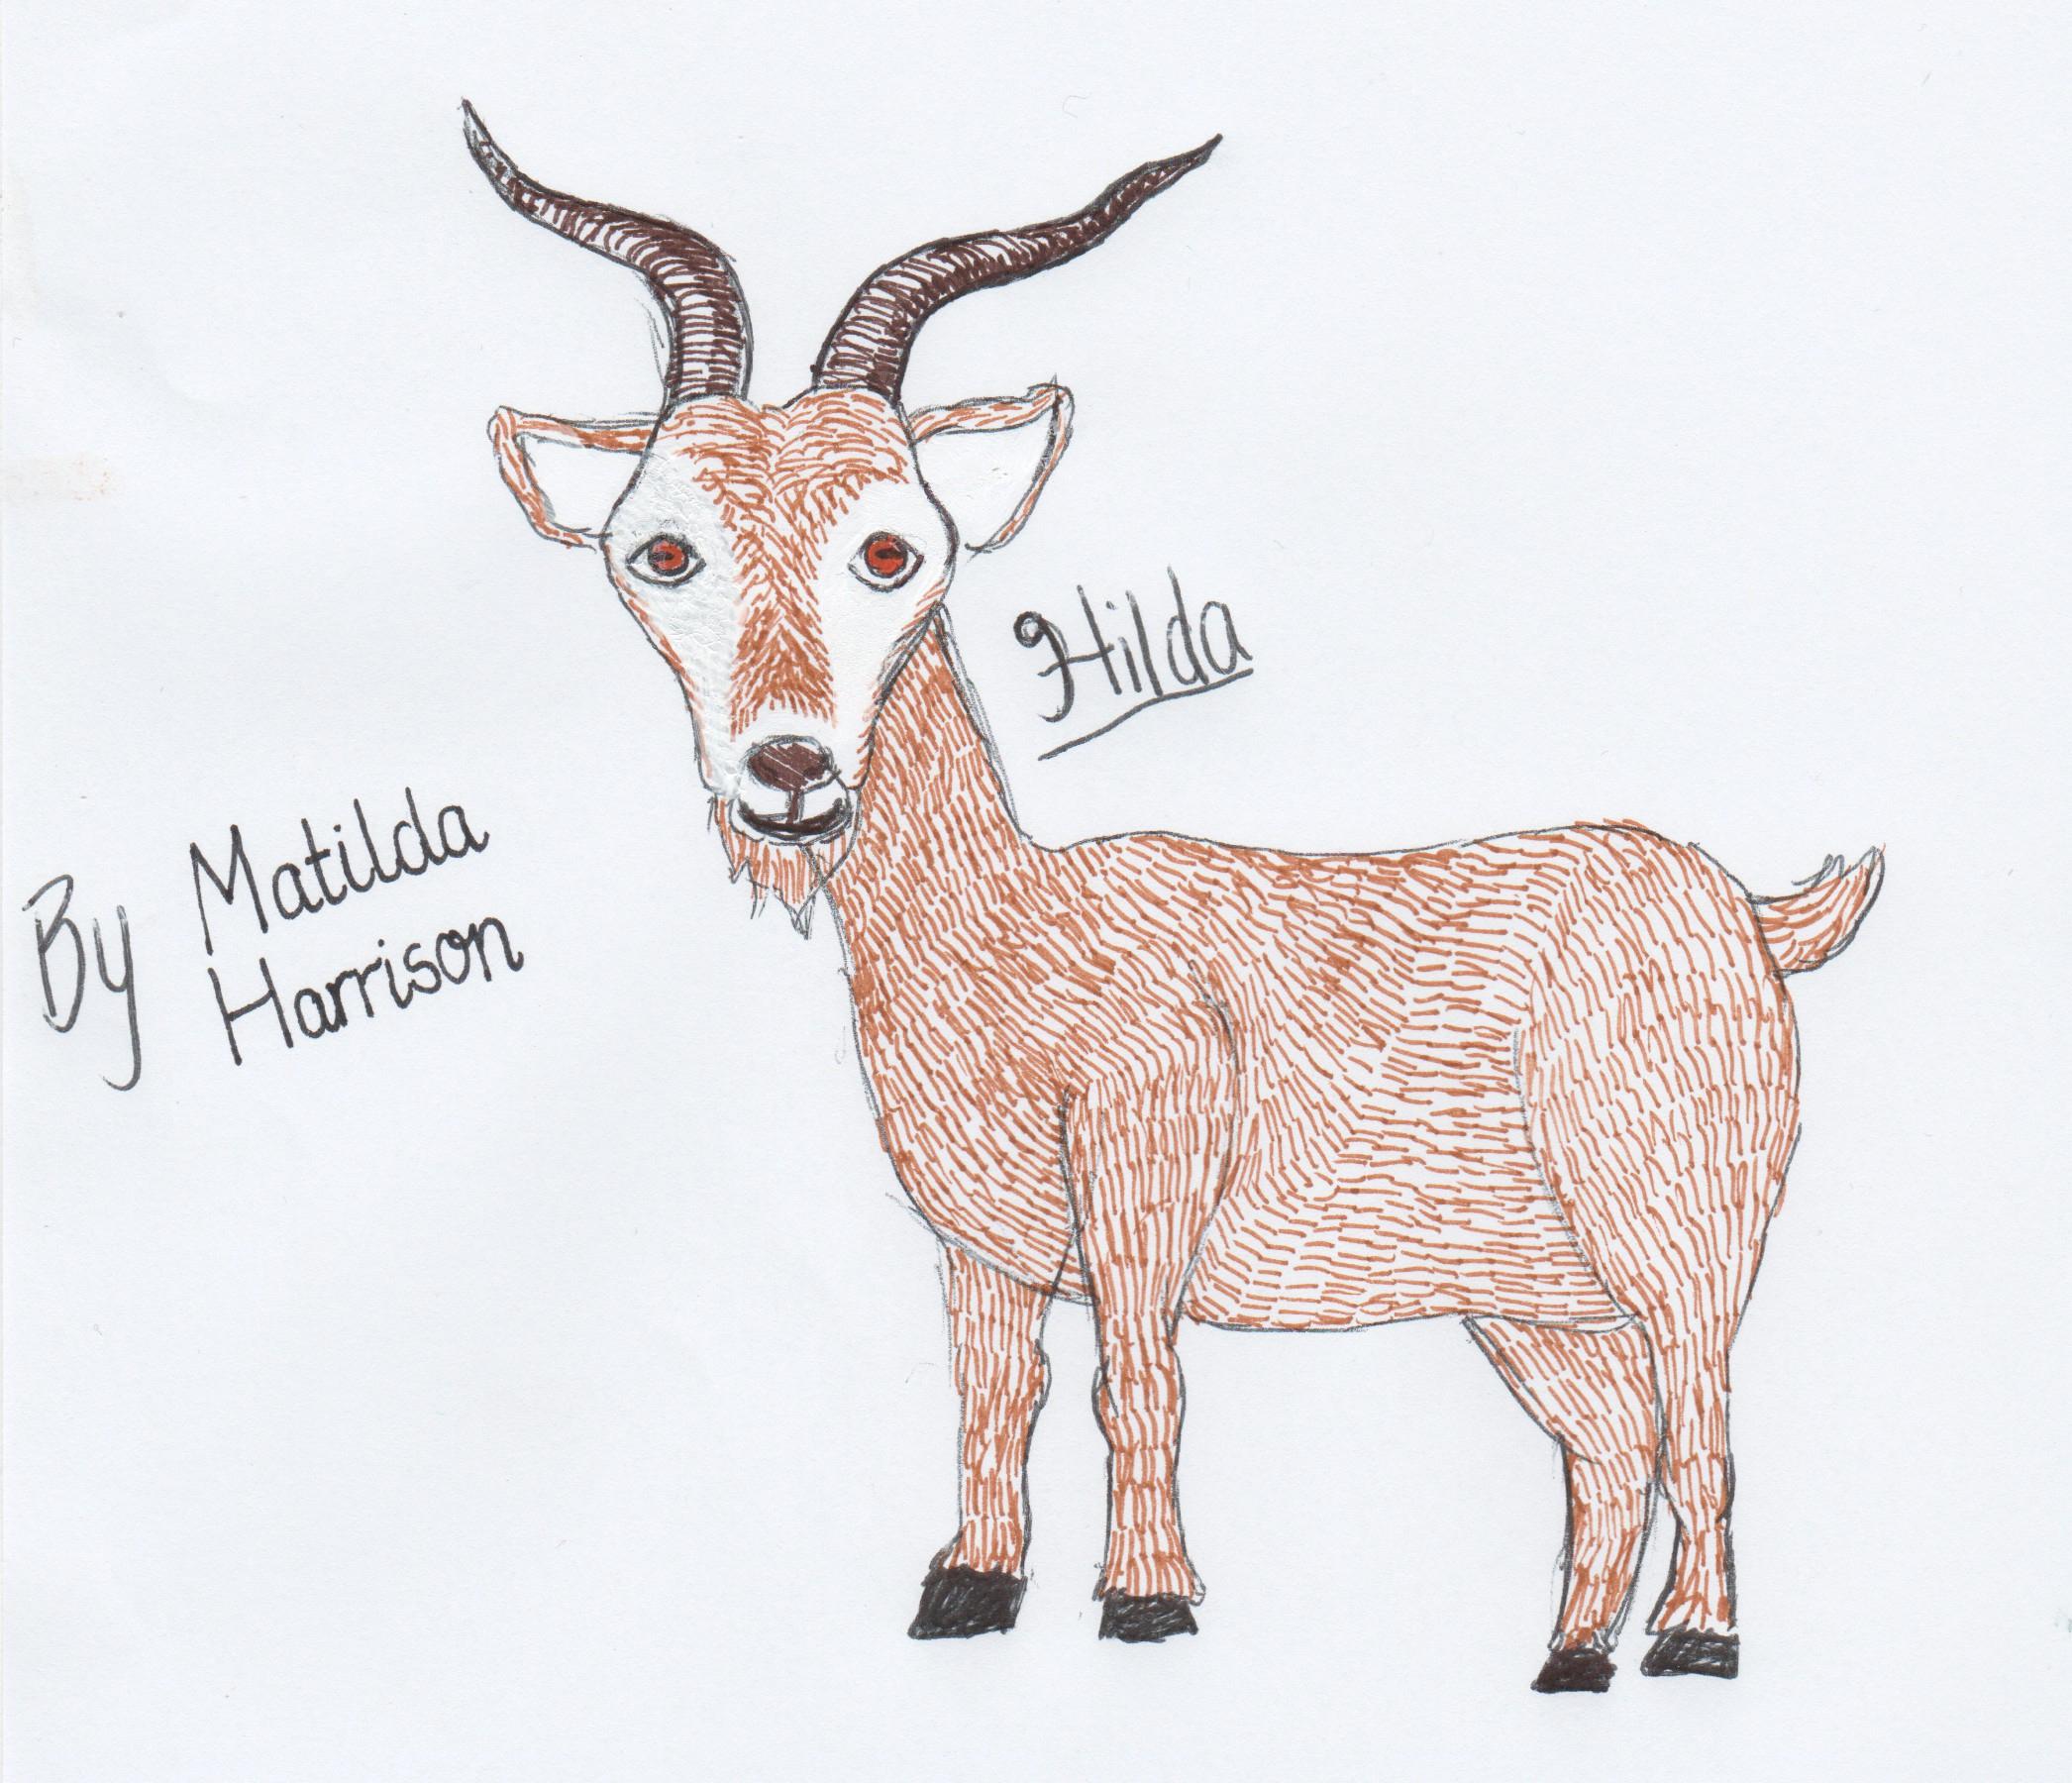 Matilda Harrison, Age 12